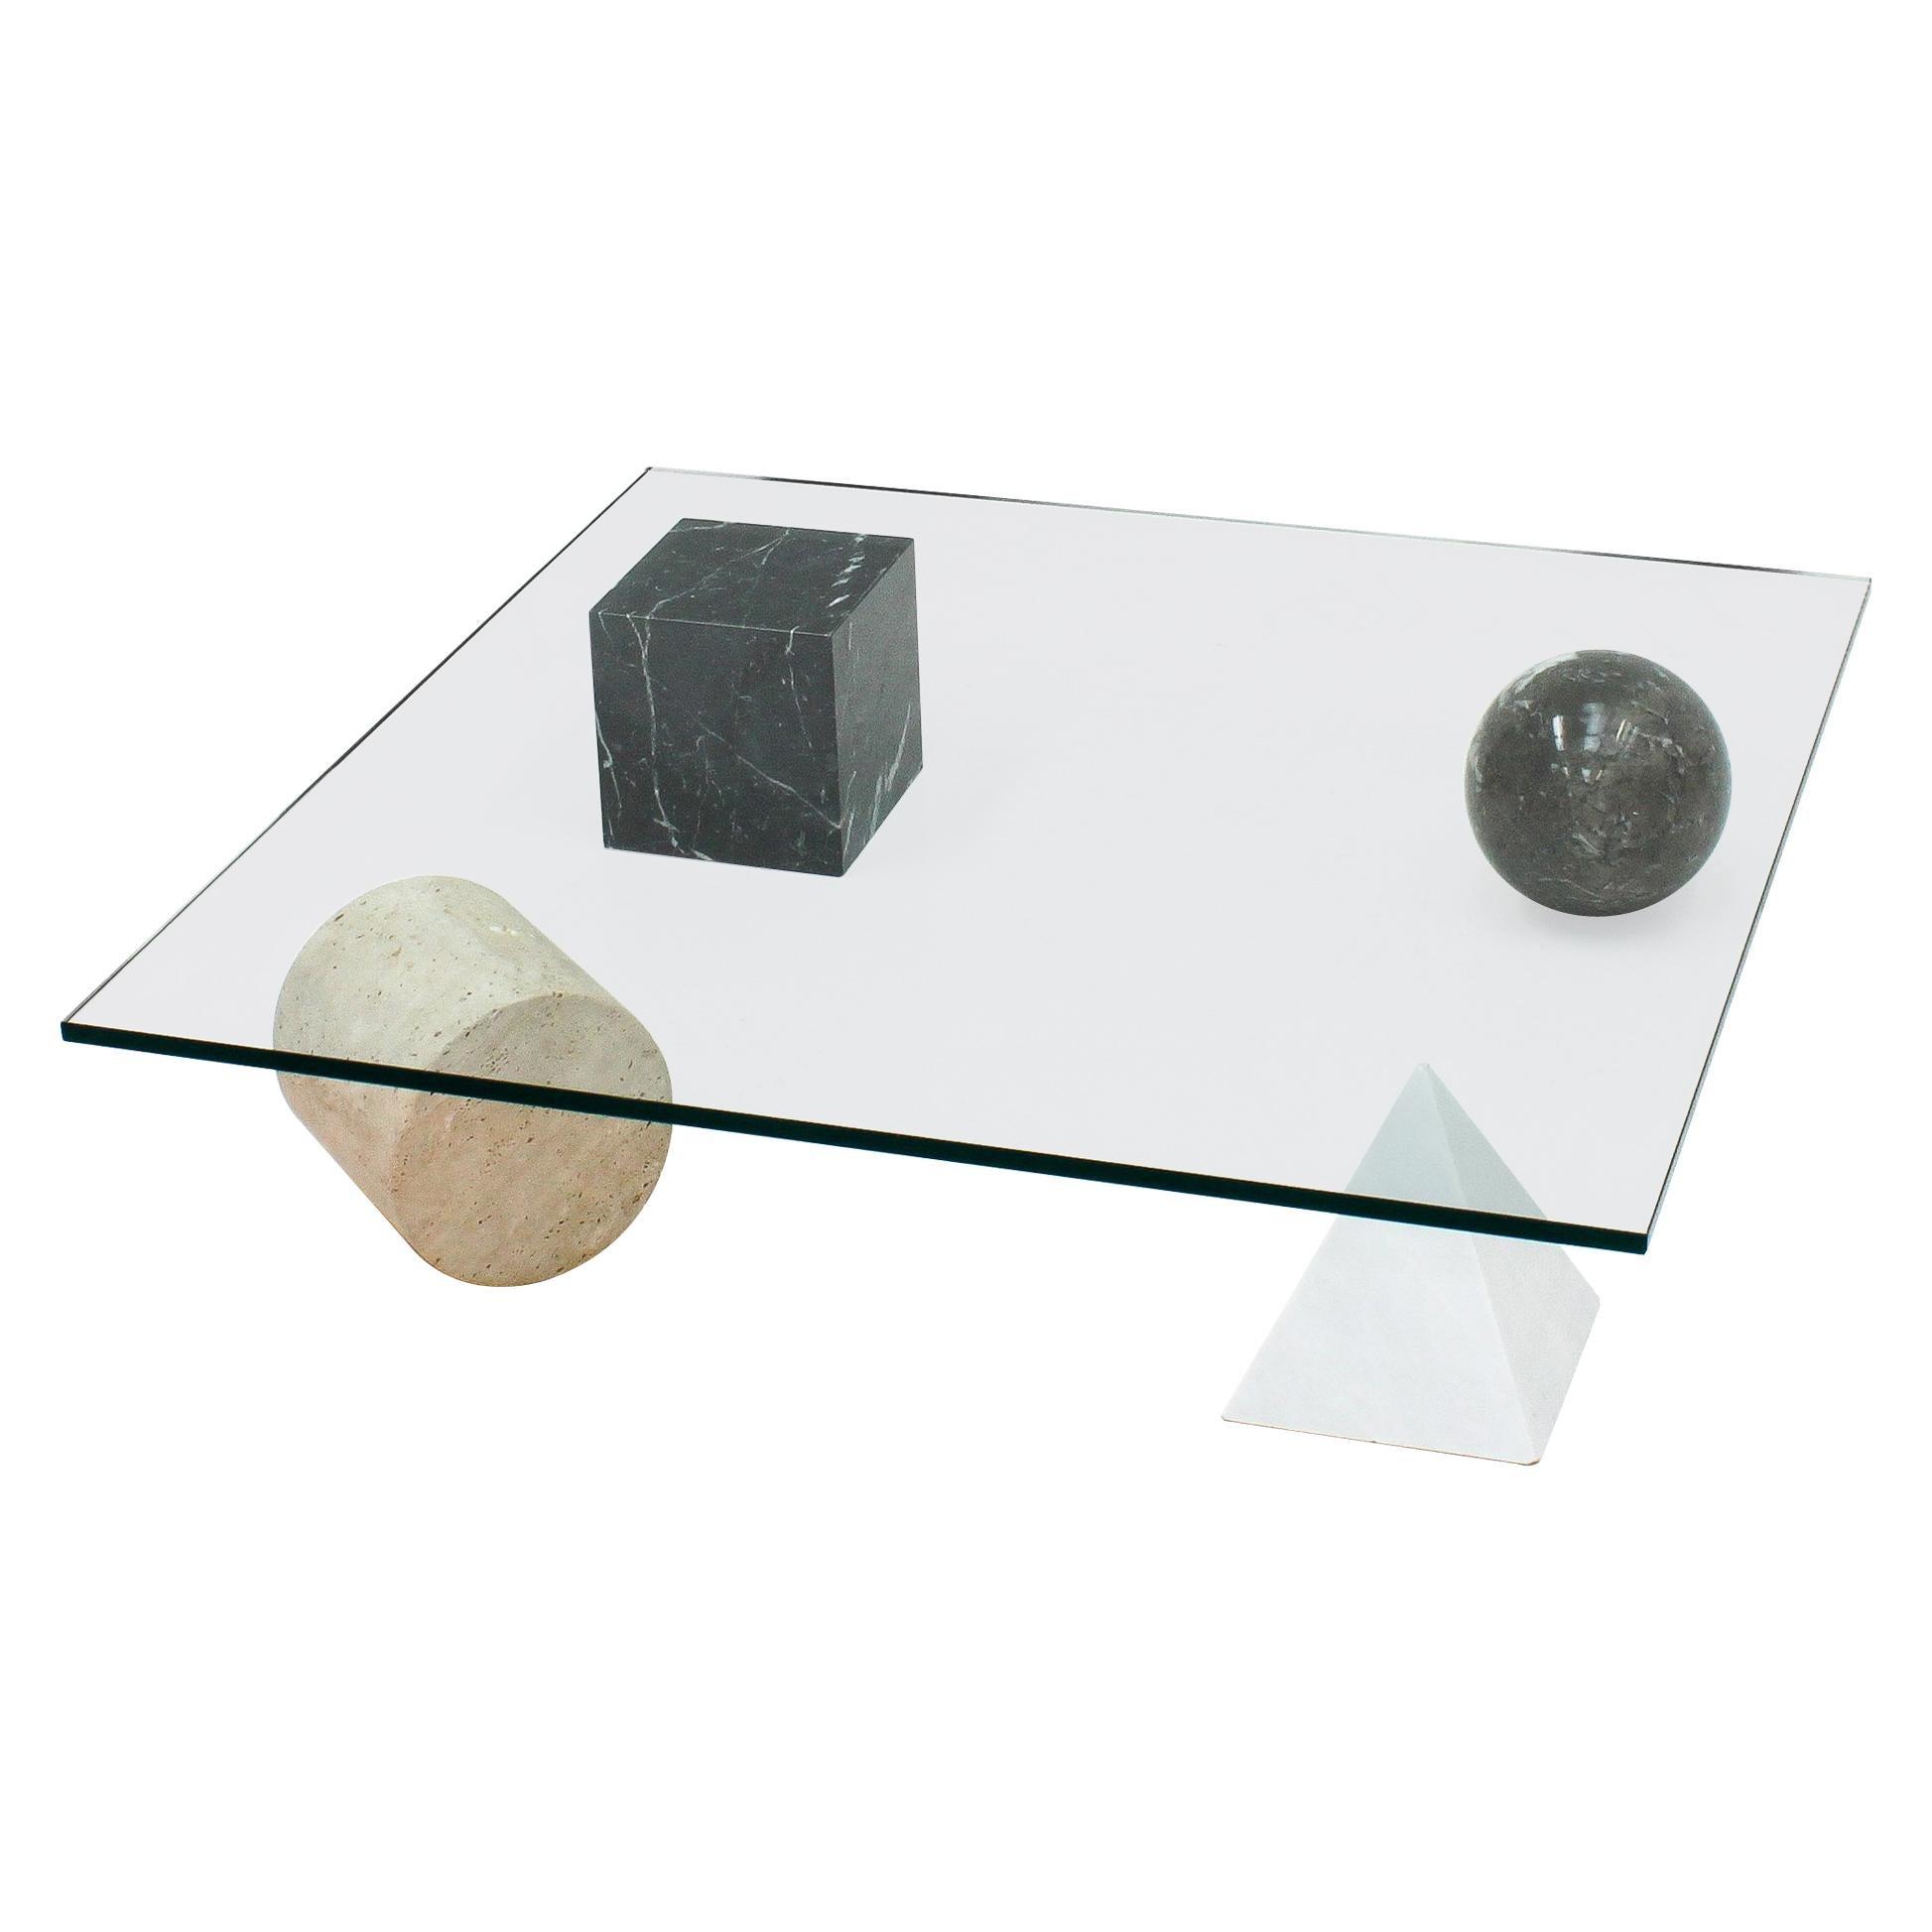 'Metafora' Coffee Table by Massimo and Lella Vignelli for Casigliani Italy, 1979